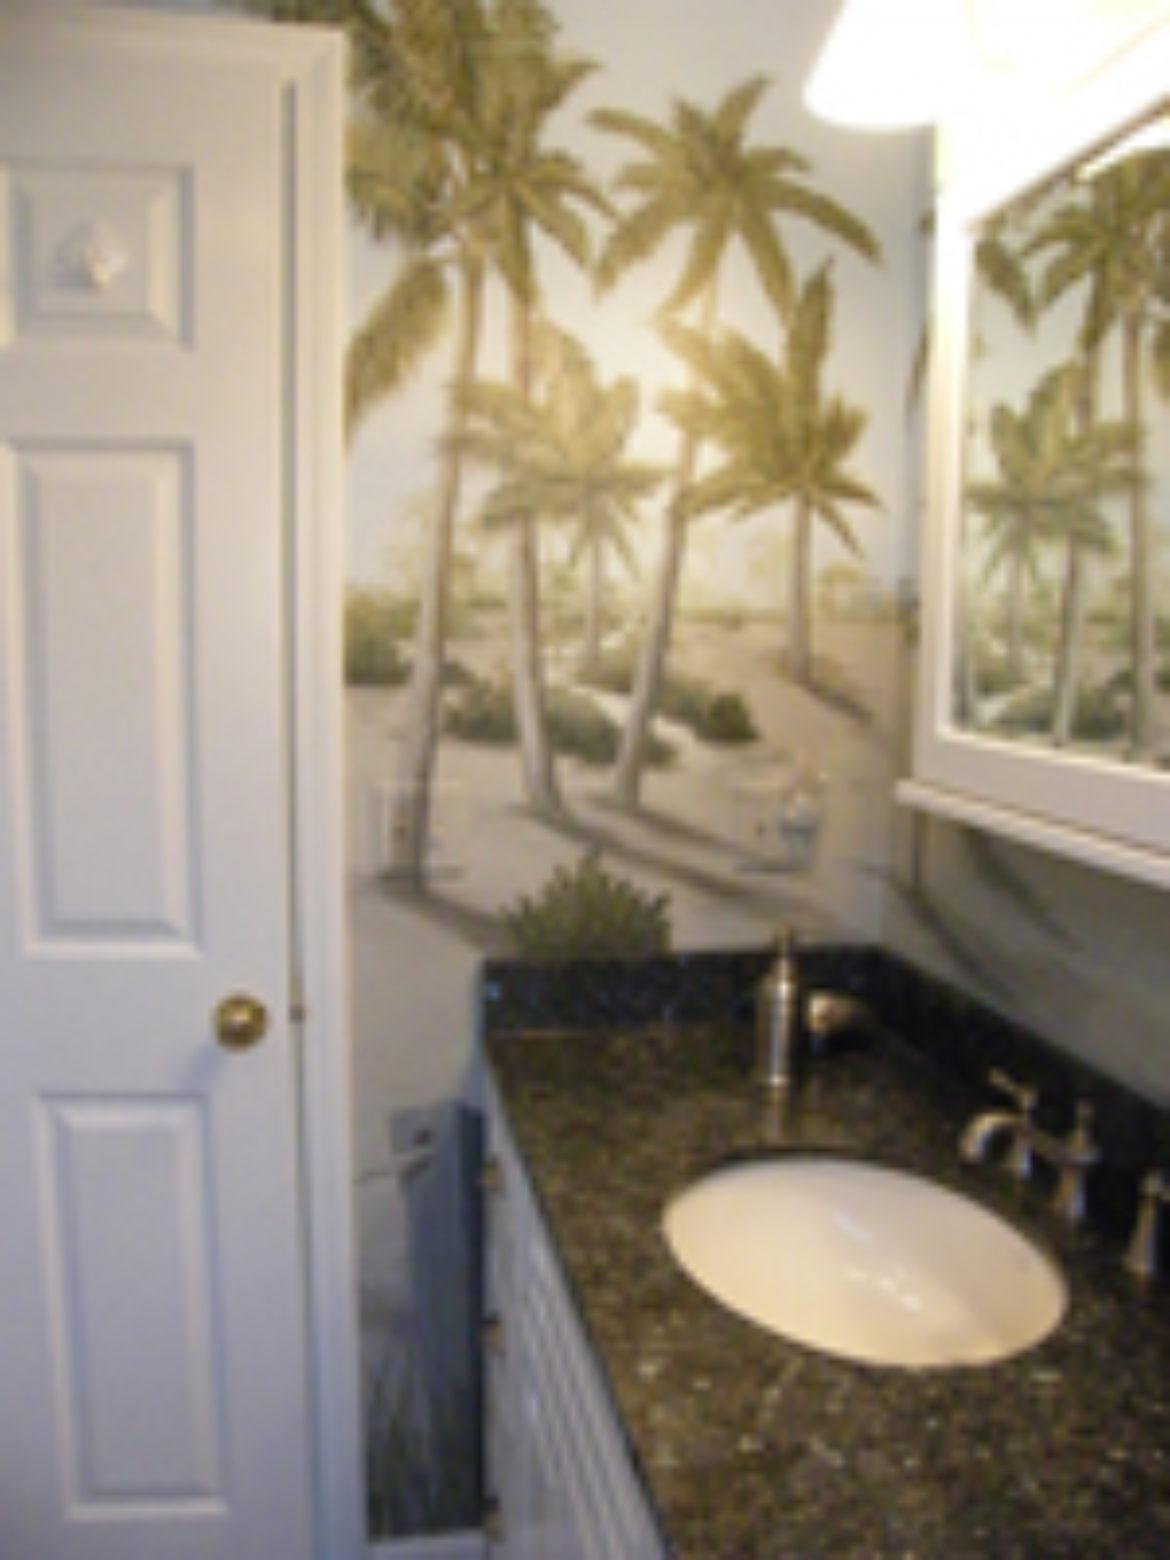 Bath with palm trees